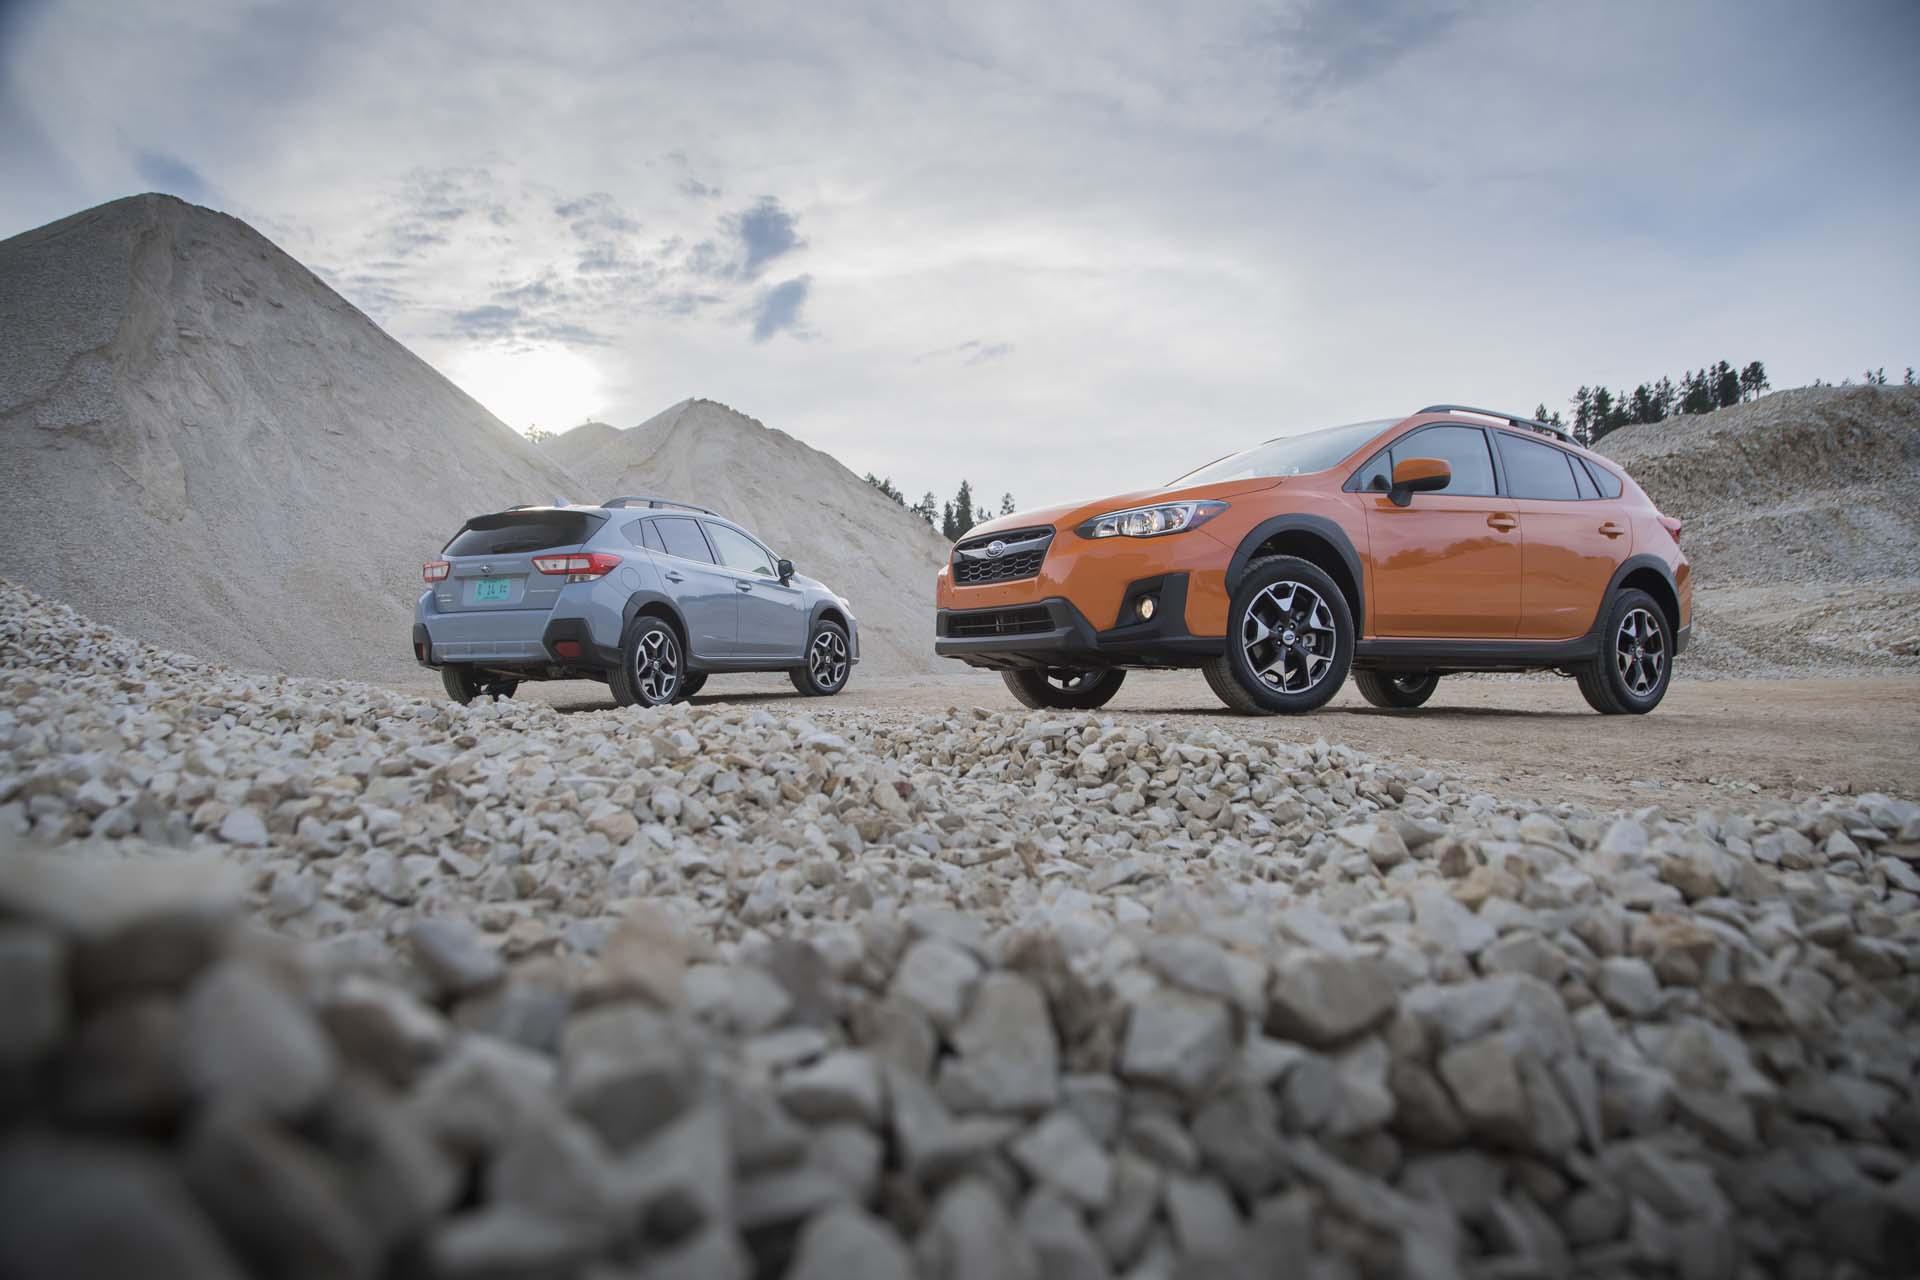 Subaru Crosstrek Vs Jeep Renegade Compare Cars - 2018 subaru crosstrek invoice price